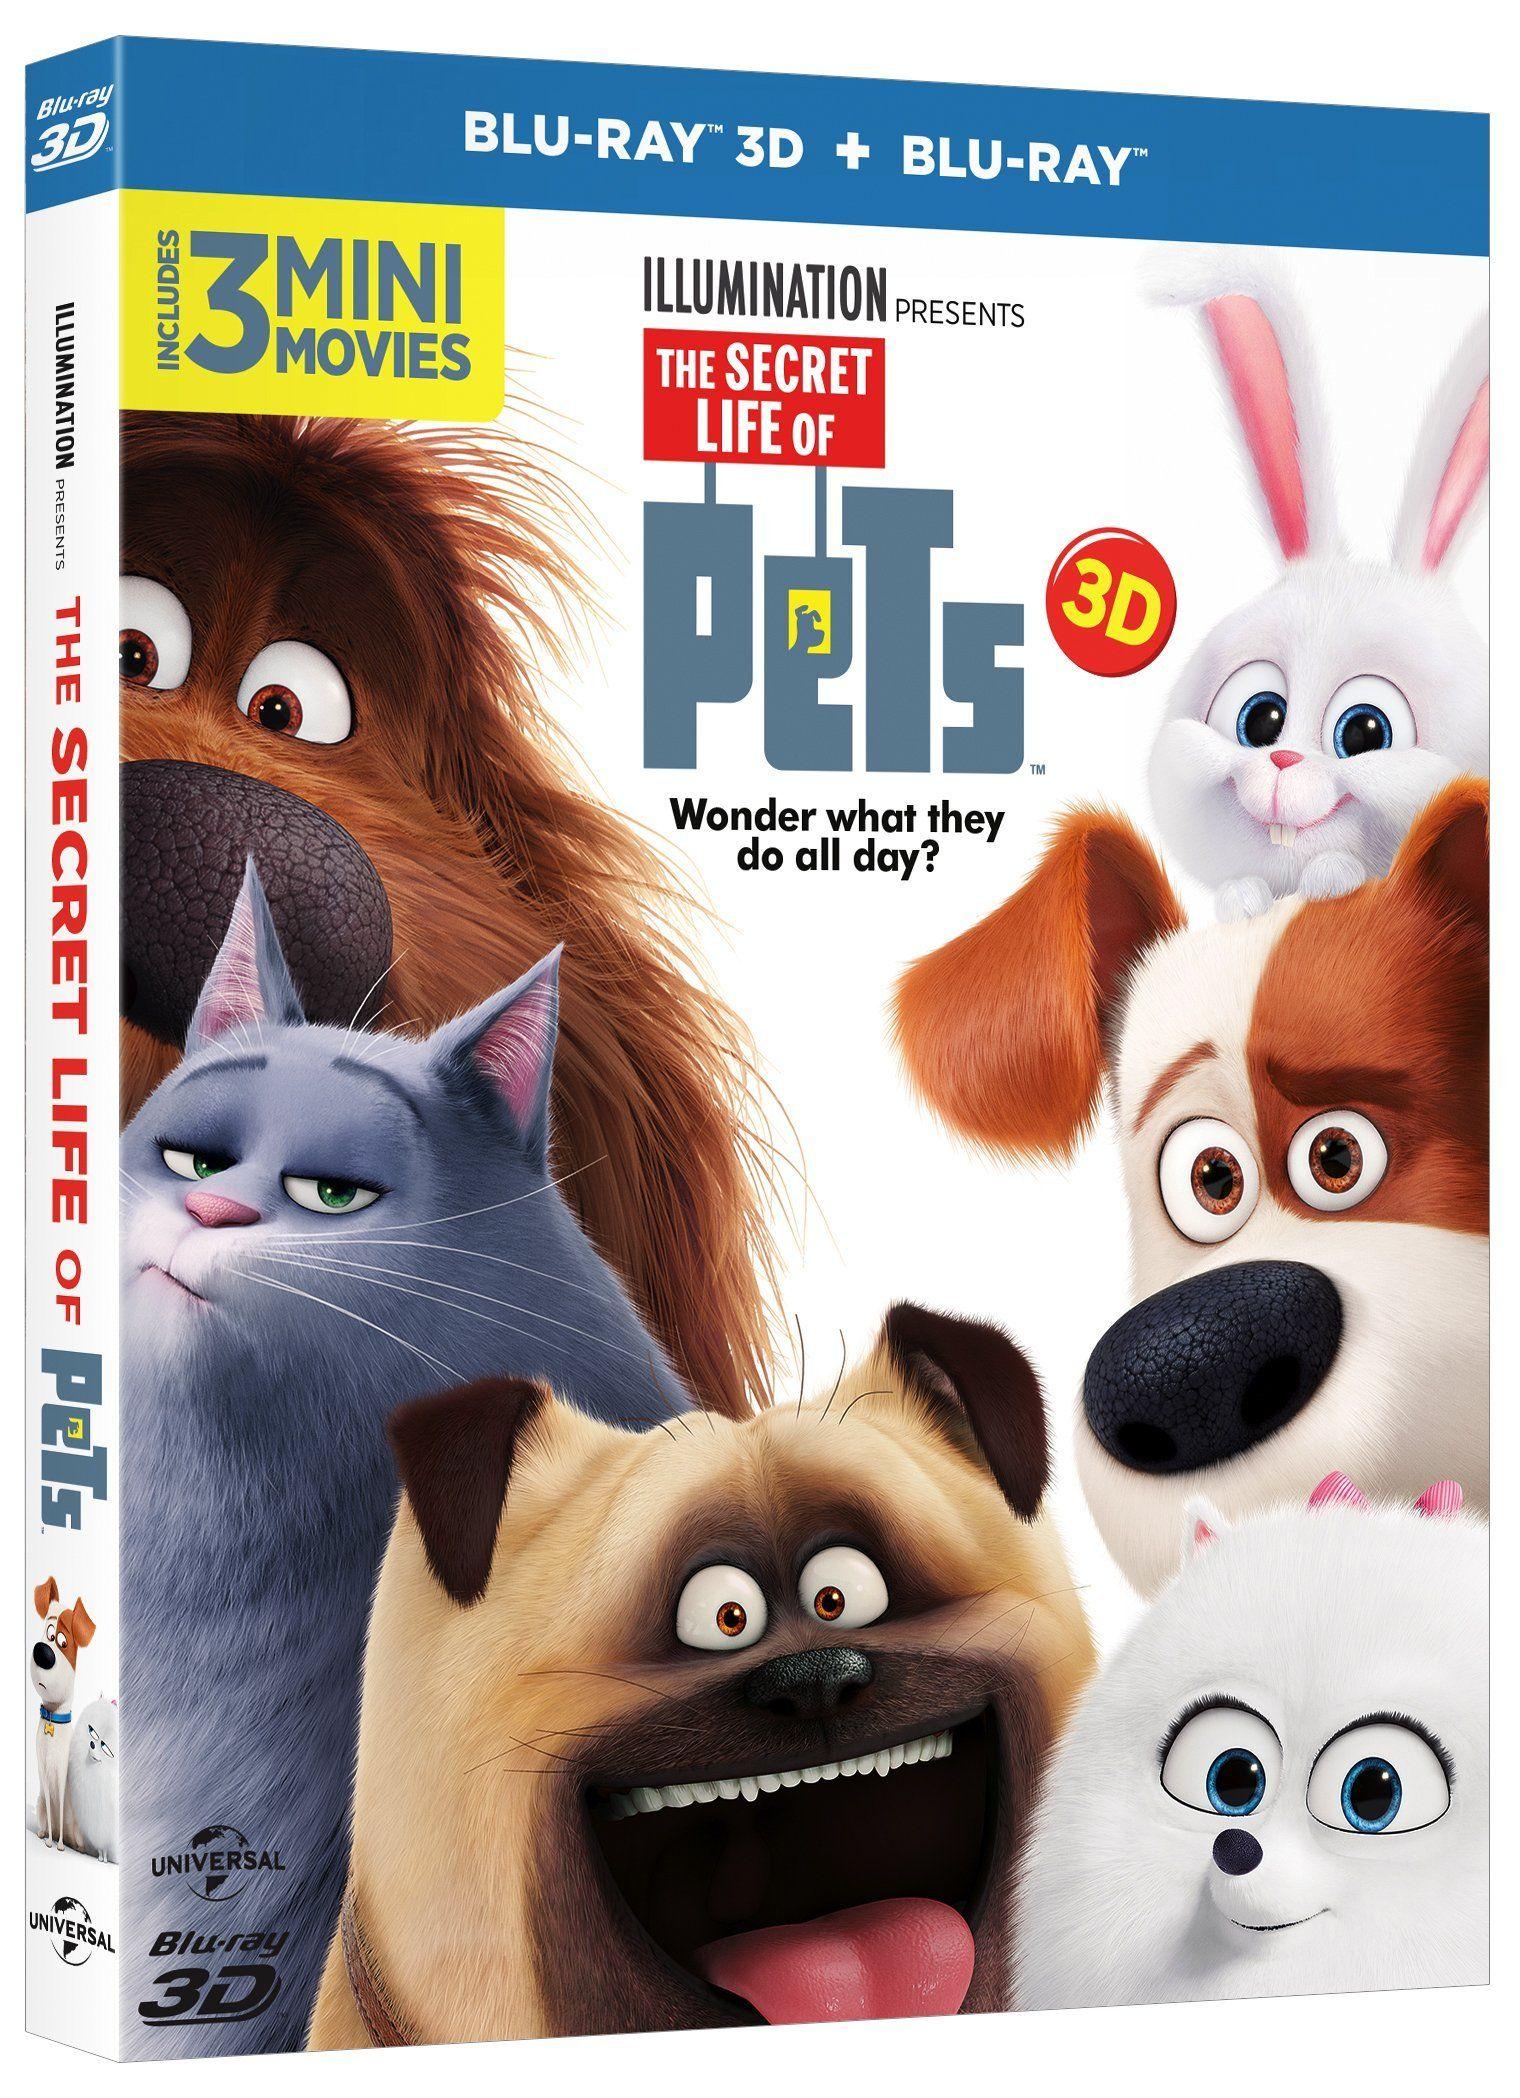 Pets Vita Da Animali Blu Ray 3d Blu Ray Pets Da Vita Pets Ray Animali Dvd Locandine Di Film